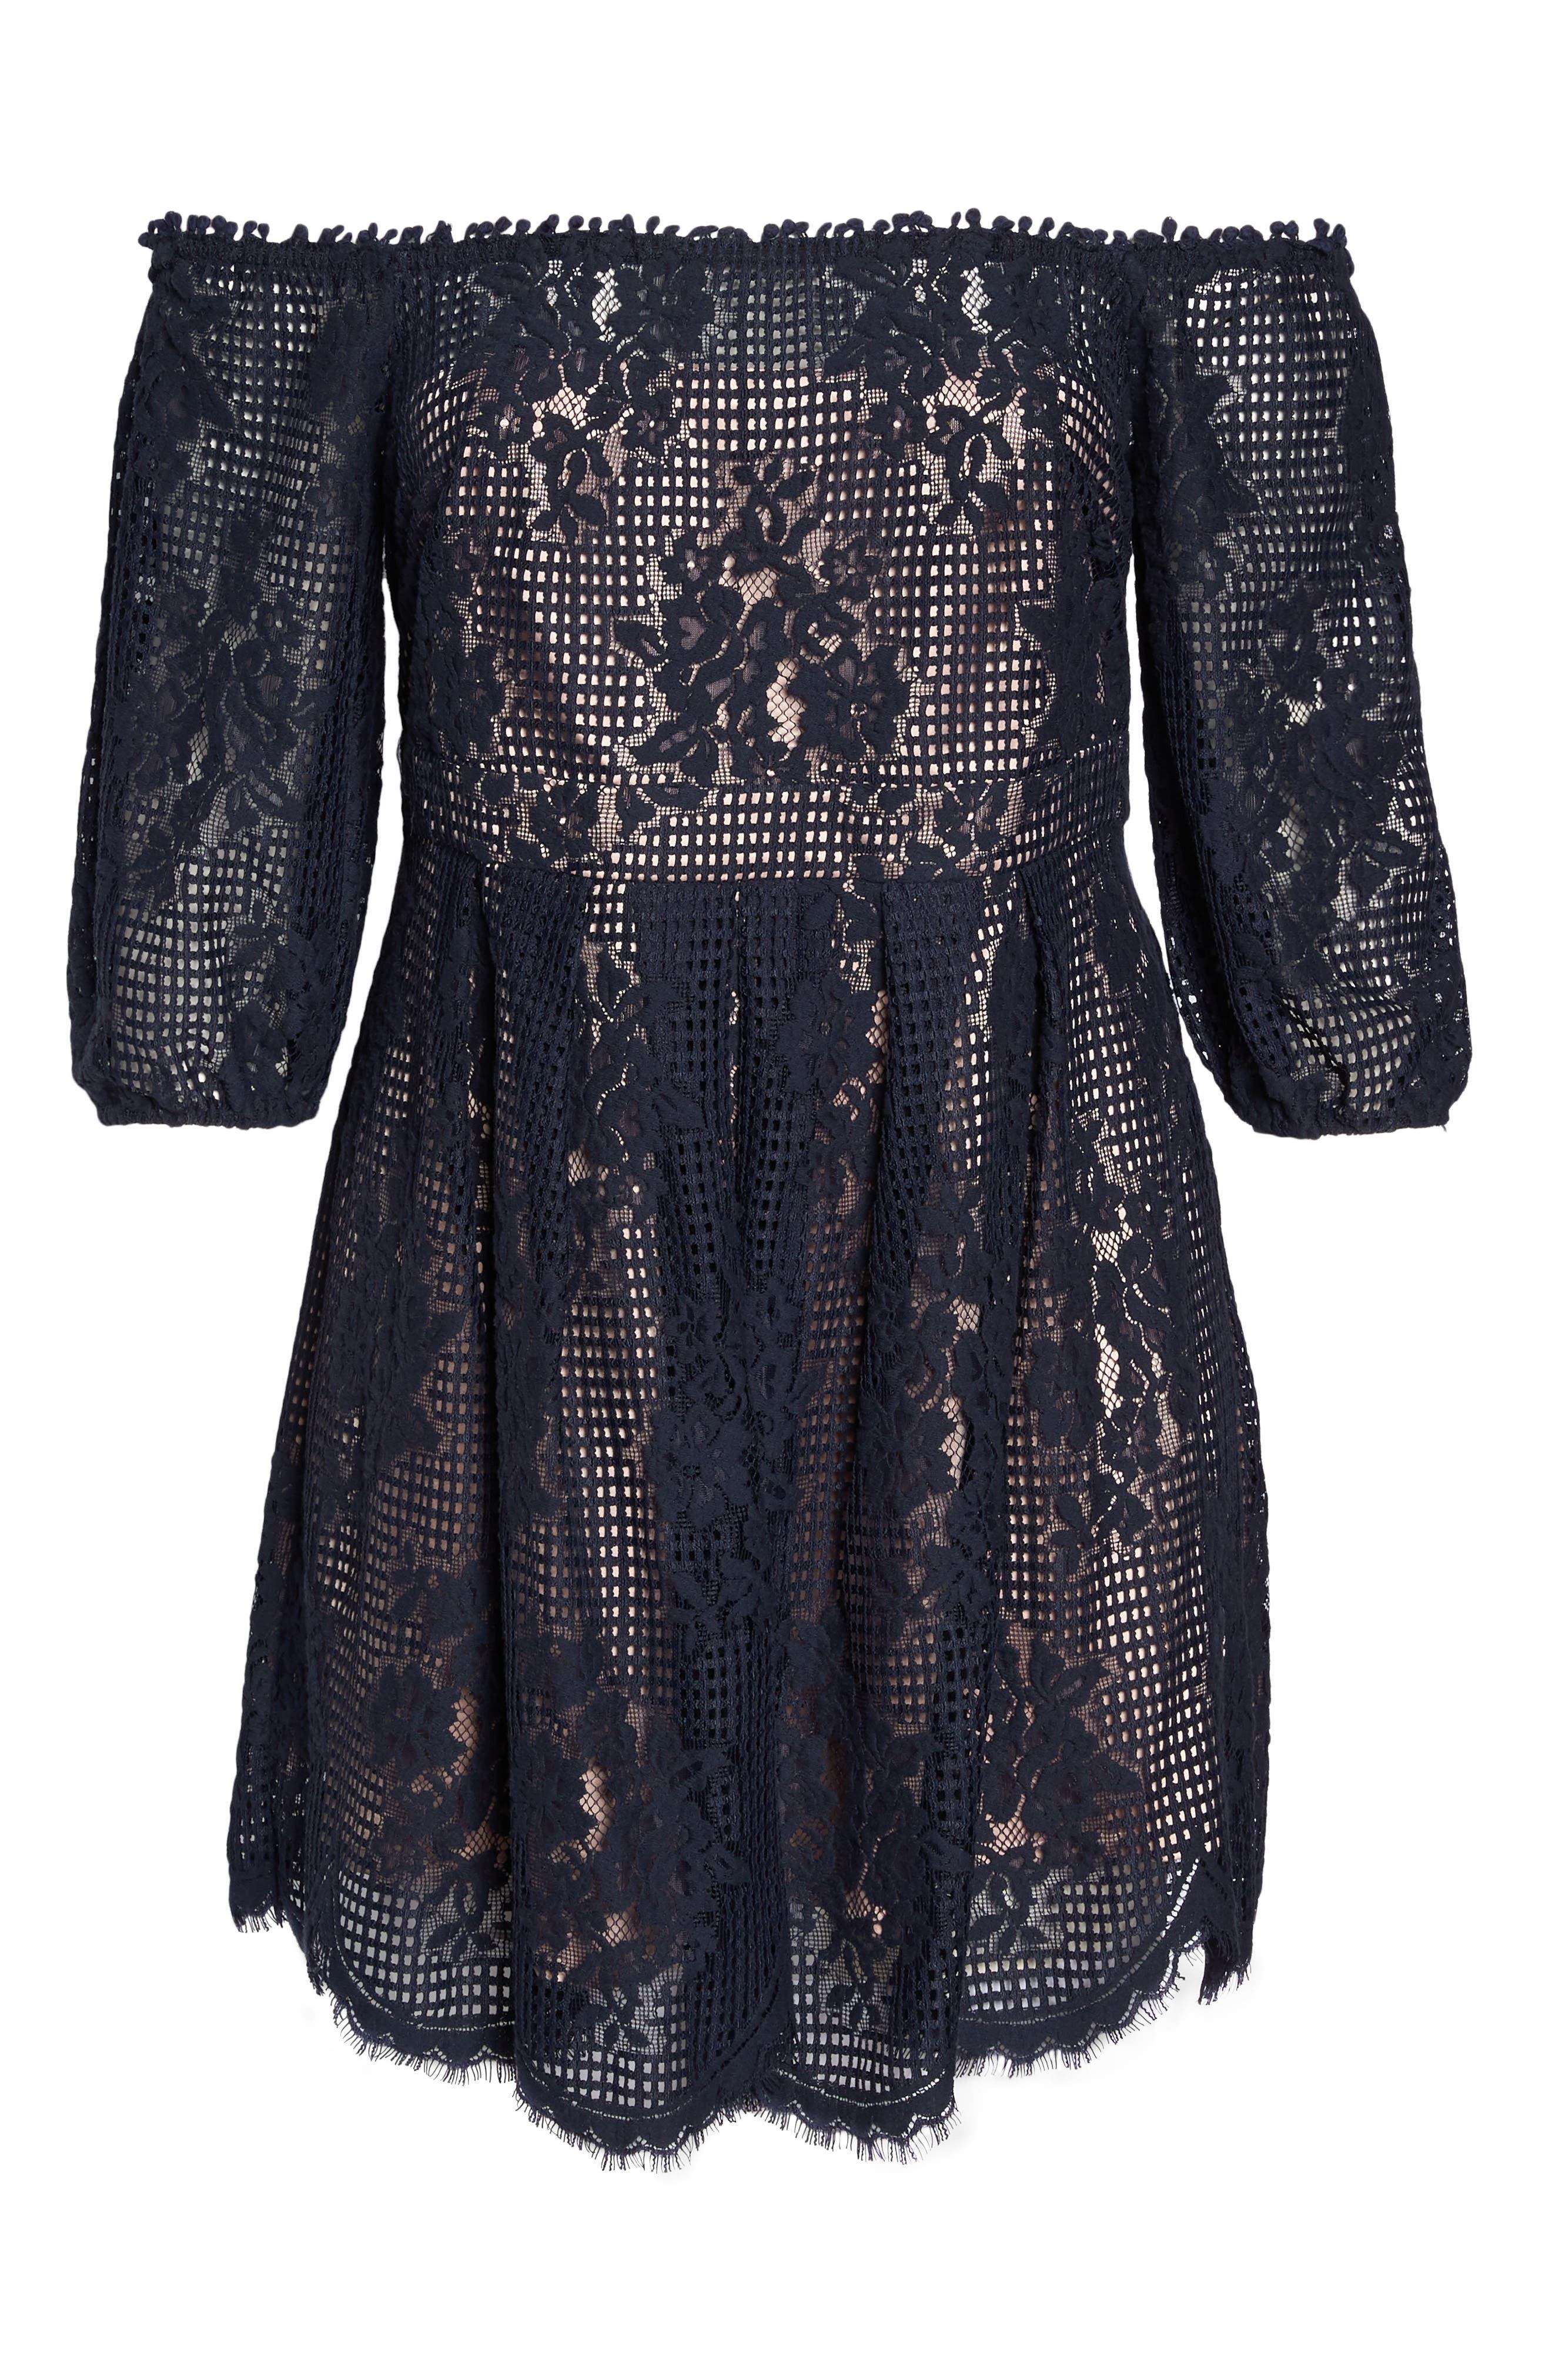 Floral Lace Off the Shoulder Dress,                             Alternate thumbnail 6, color,                             Navy Sapphire